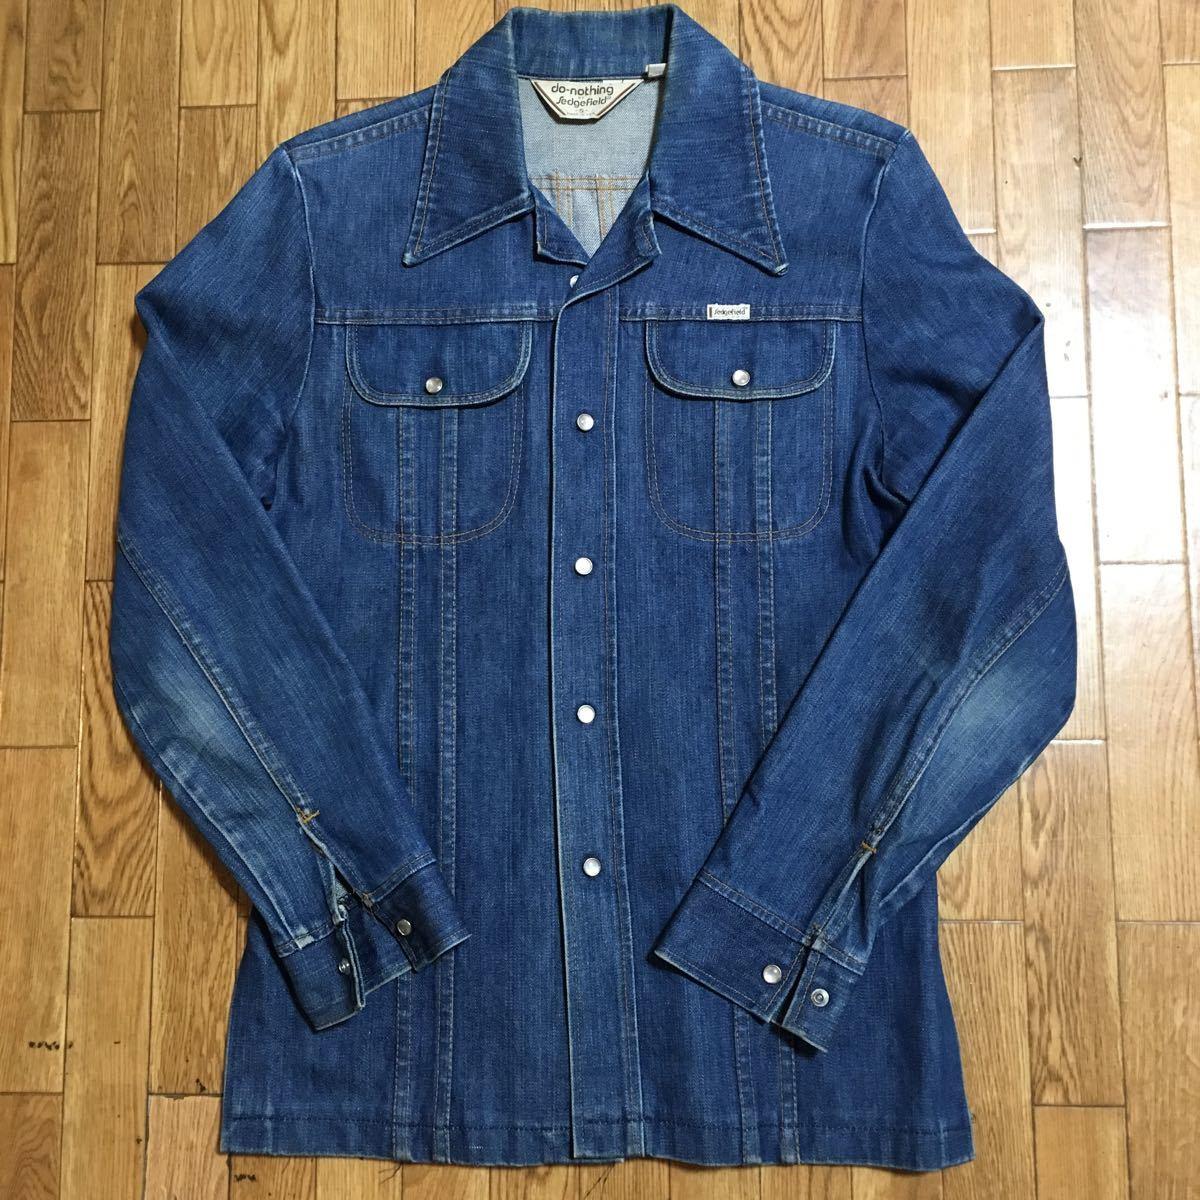 70s USA製 SEDGEFIELD DO-NOTHING デニムジャケット ウエスタンシャツ Sサイズ 古着 ヴィンテージ _画像1